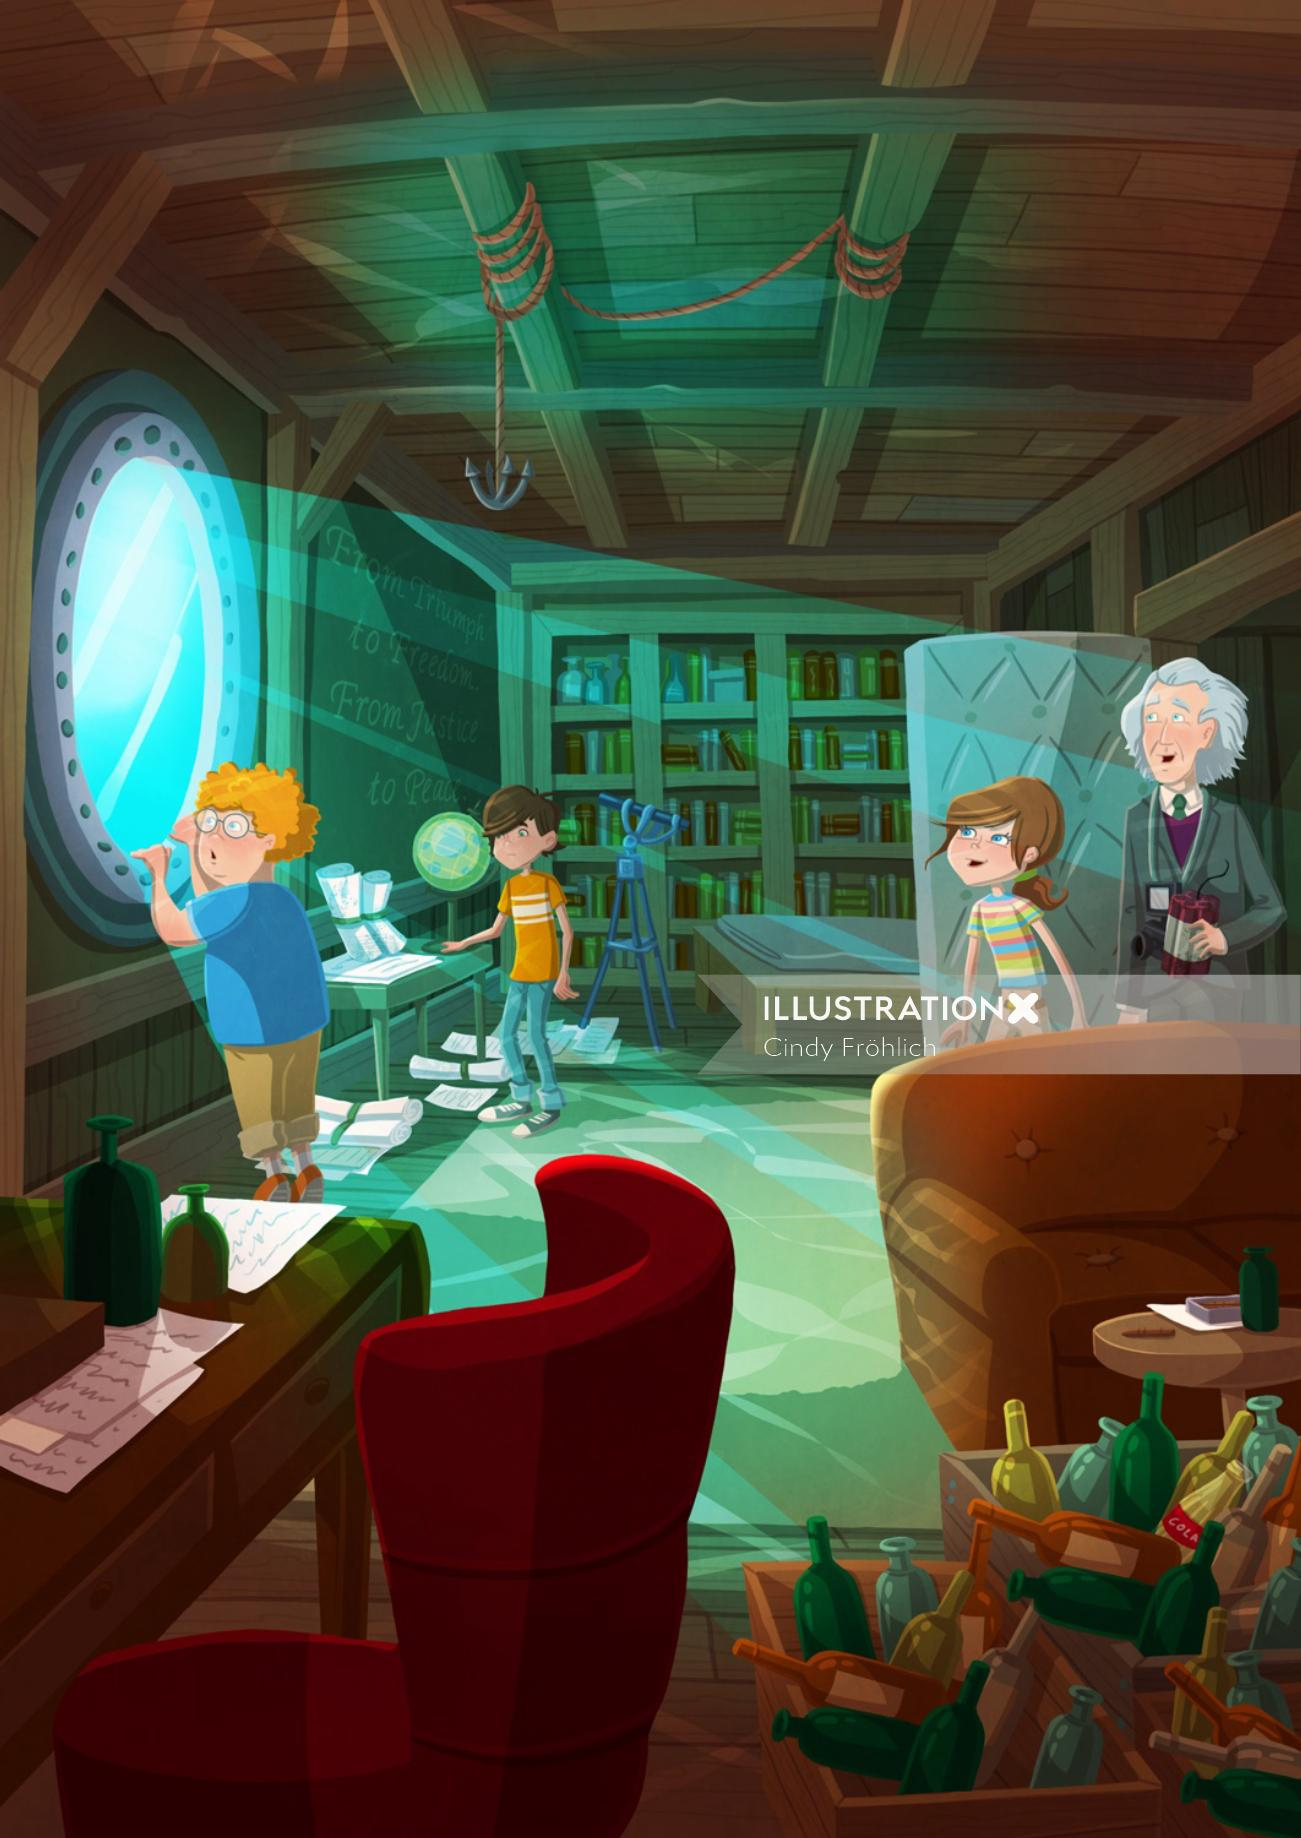 Children illustration kids in study room